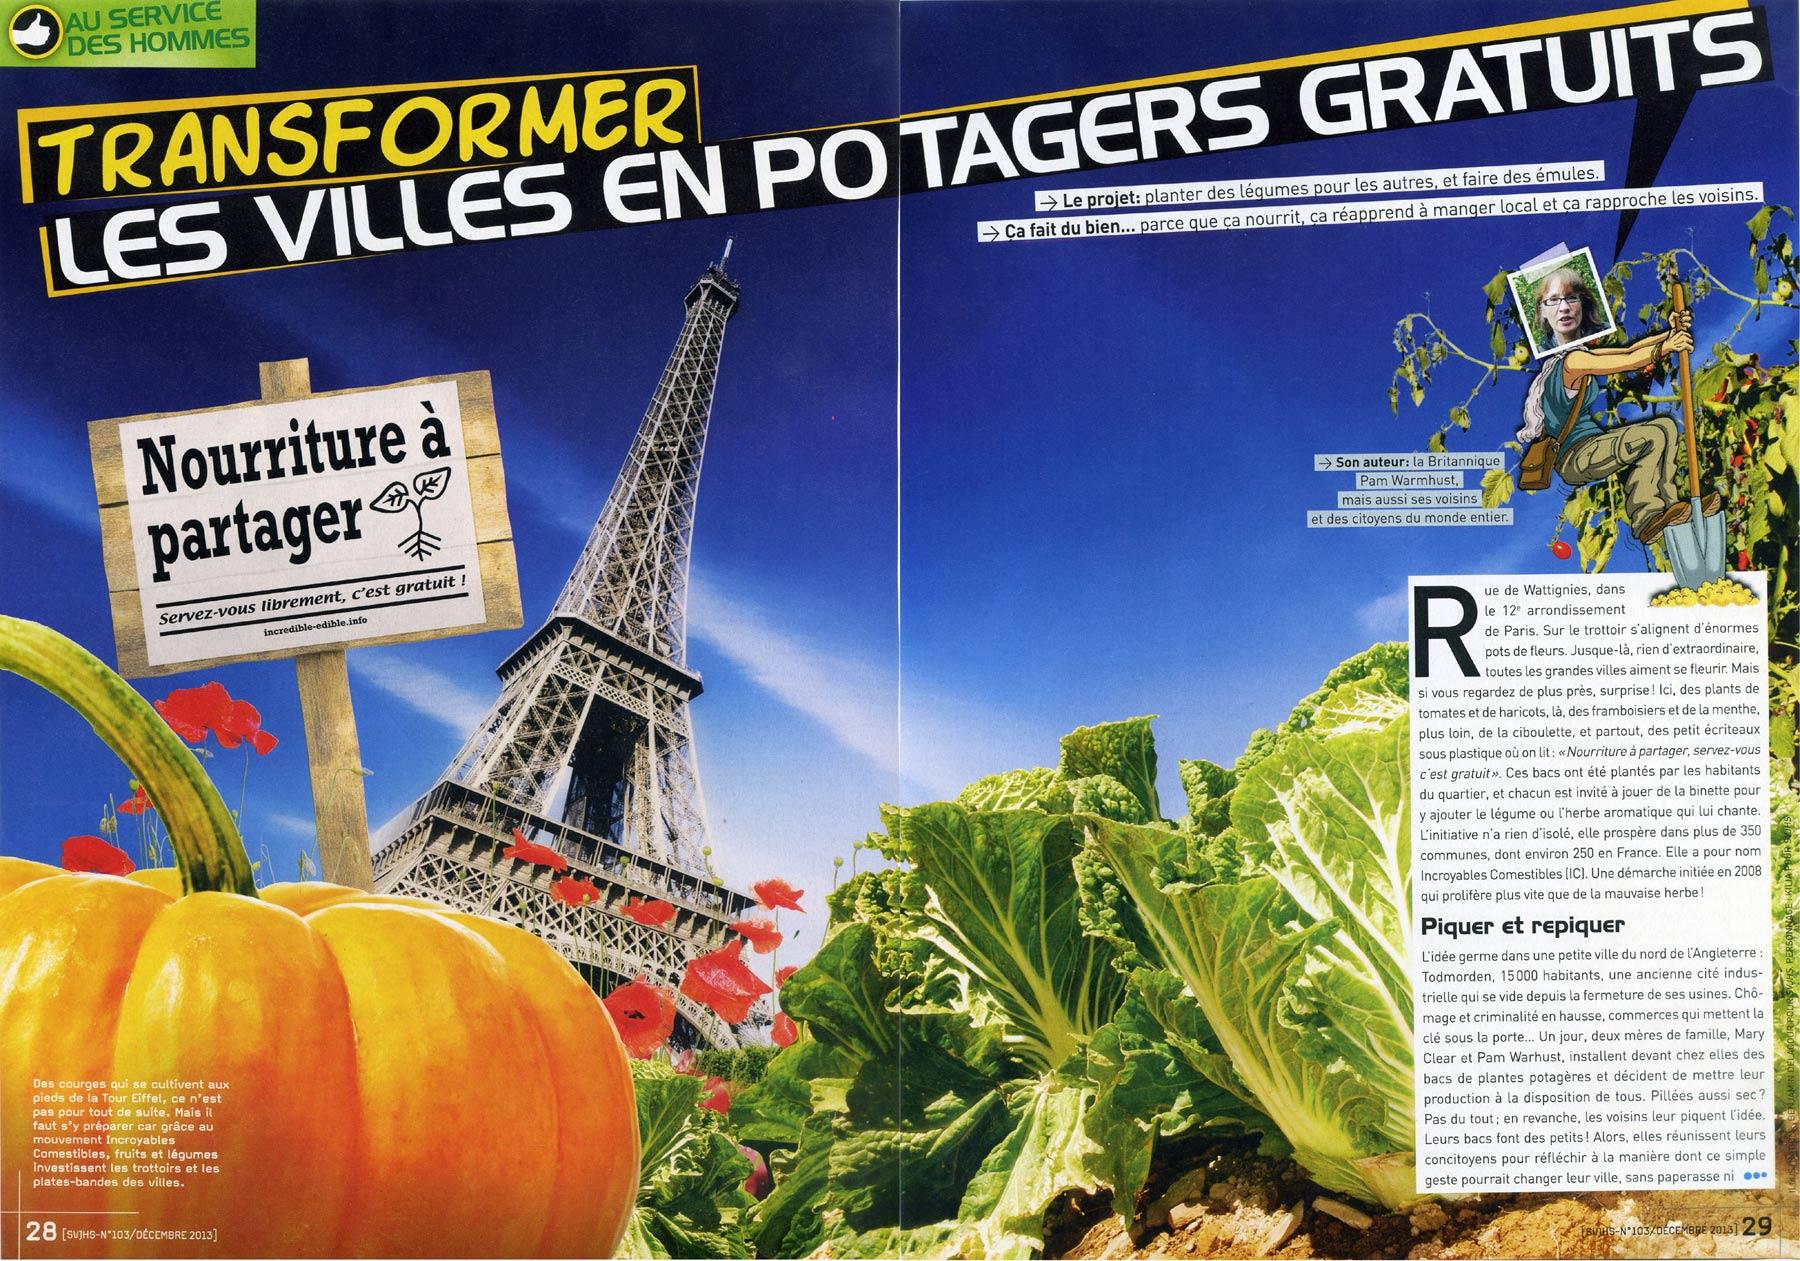 c593_incredible_edible_todmorden_france_sciences-et-vie-junior_agriculture_urbaine_autosuffisance_alimentaire_francois_rouillay_incroyables_comestibles_w1800